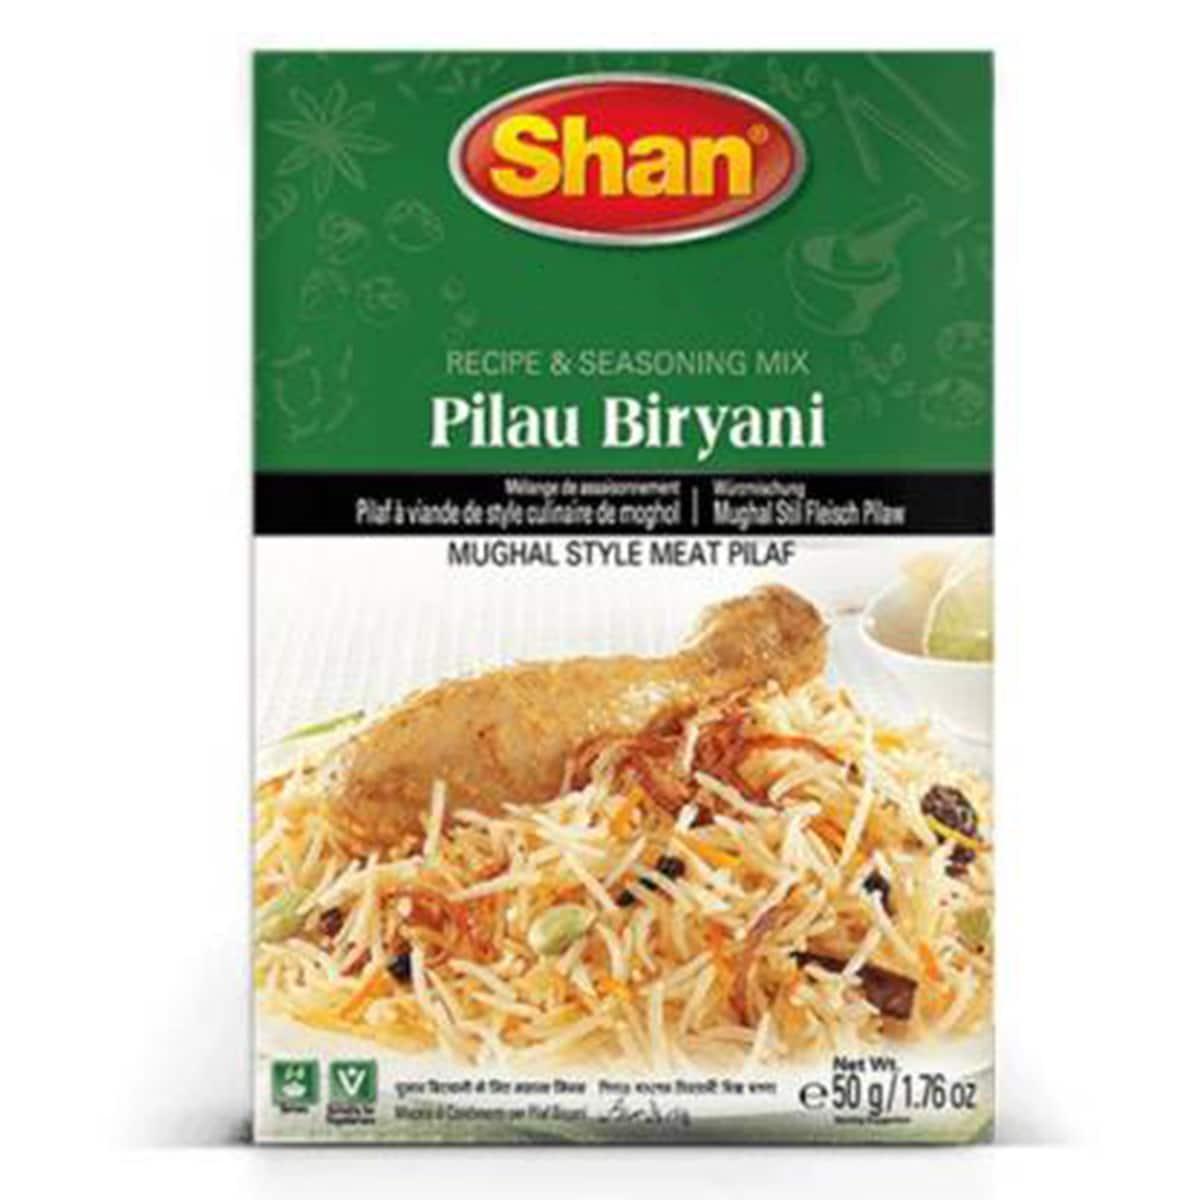 Buy Shan Pilau Biryani Mix - 50 gm